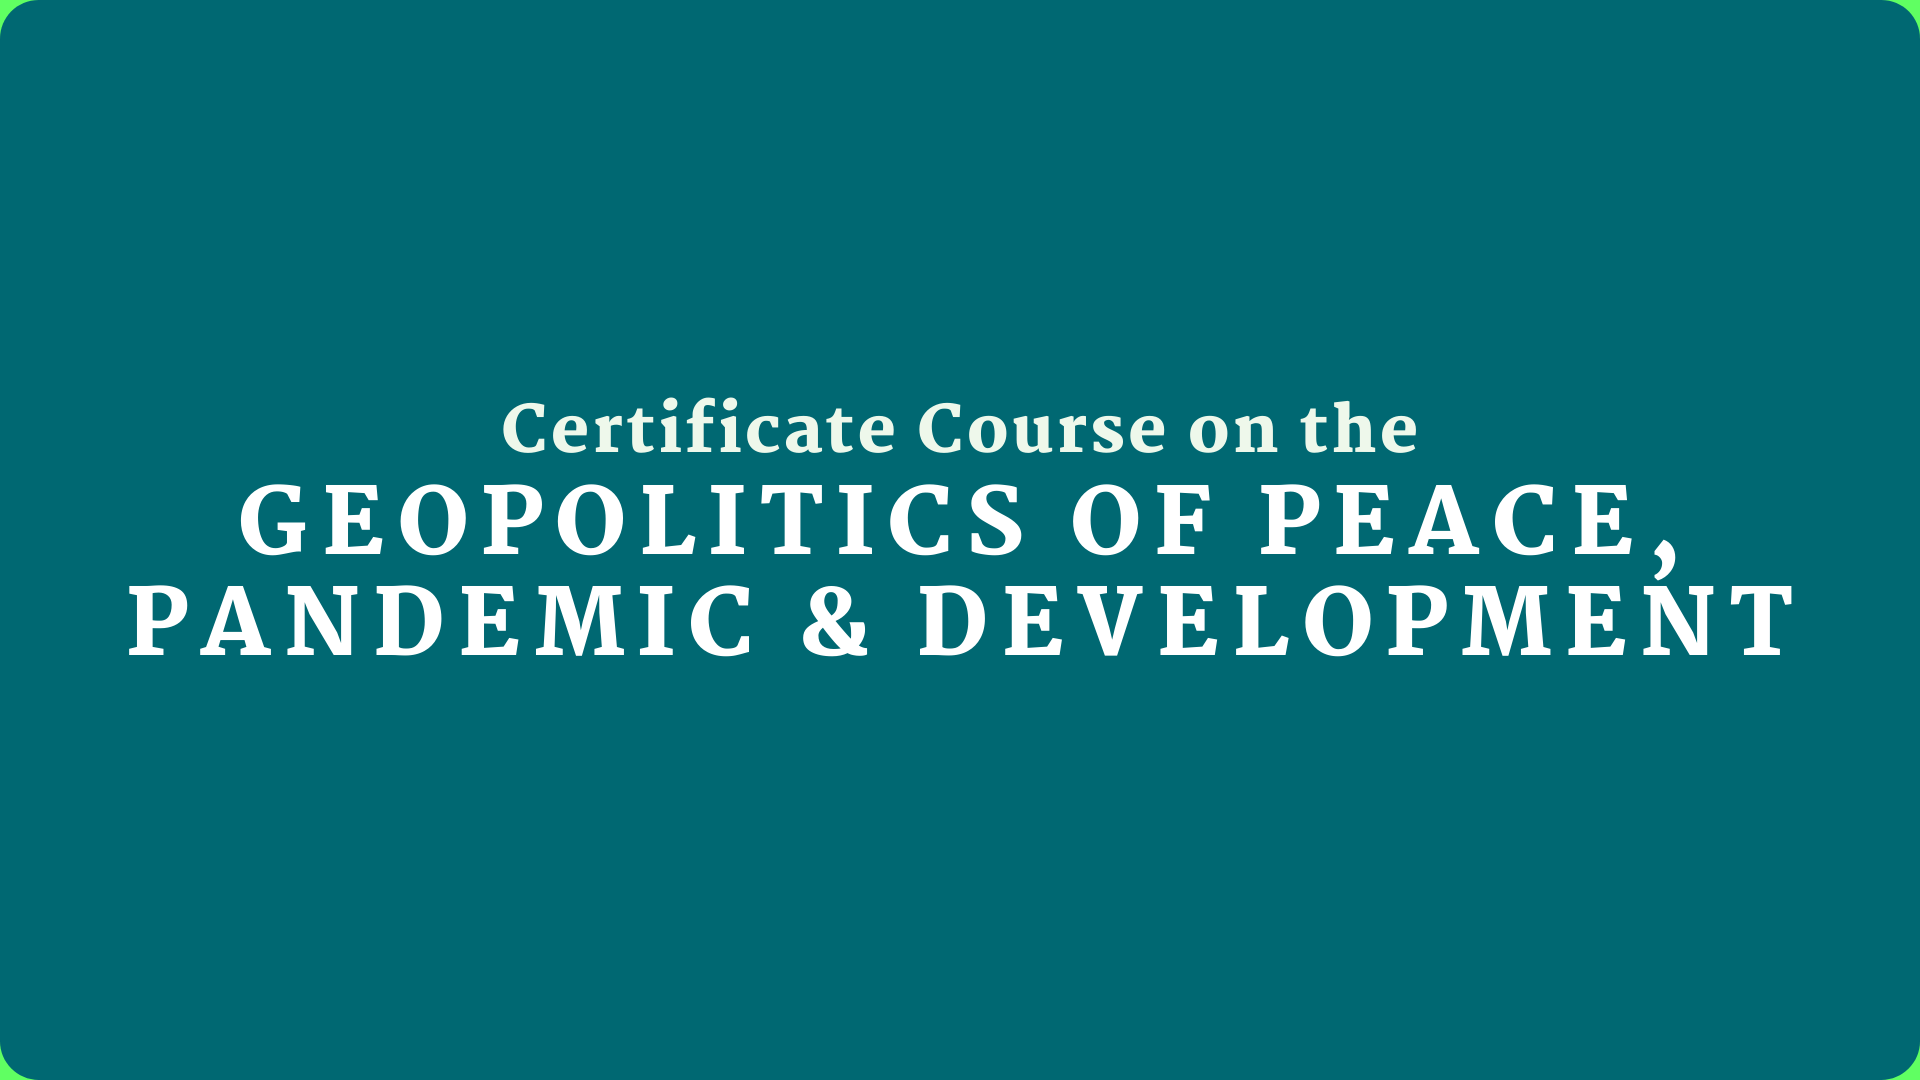 Certificate Course on Geopolitics of Peace, Pandemic & Development